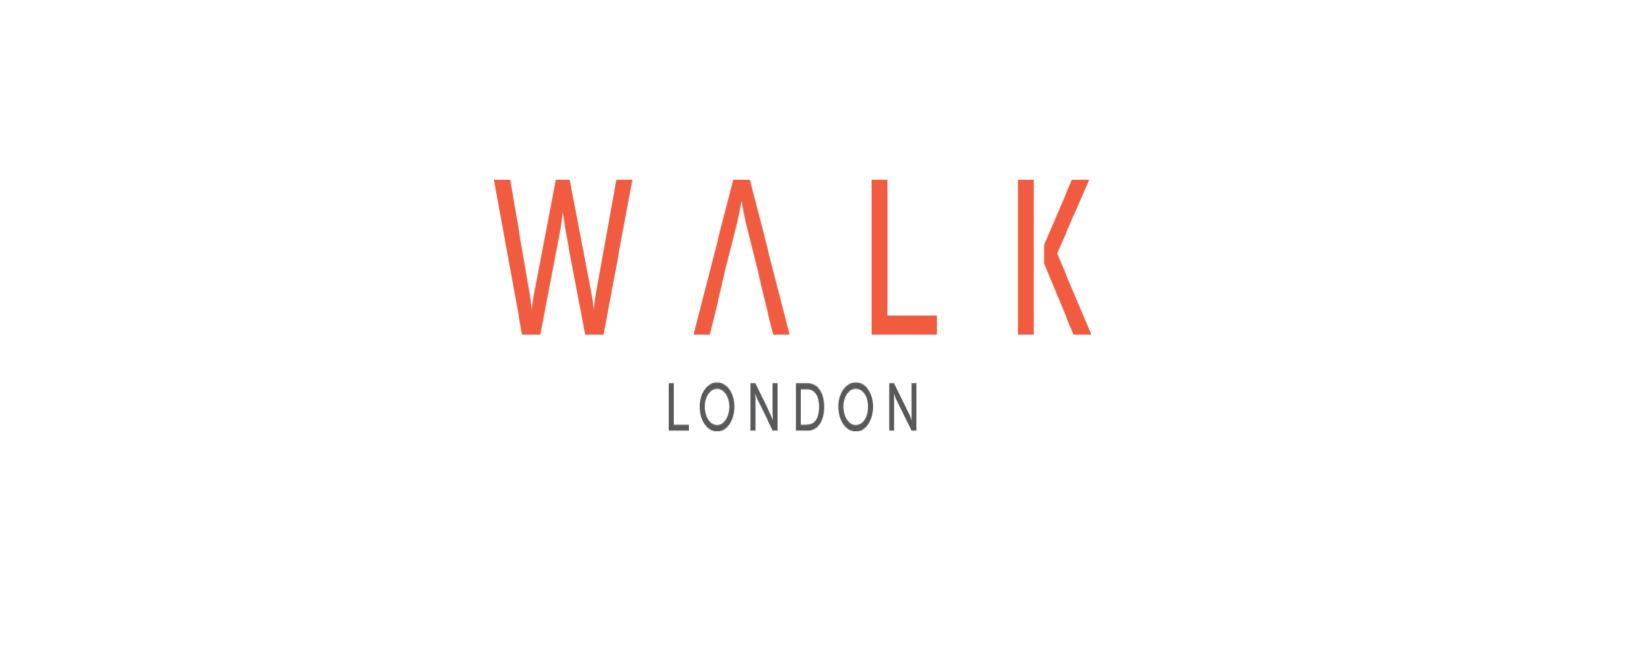 Walk London UK Discount Code 2021